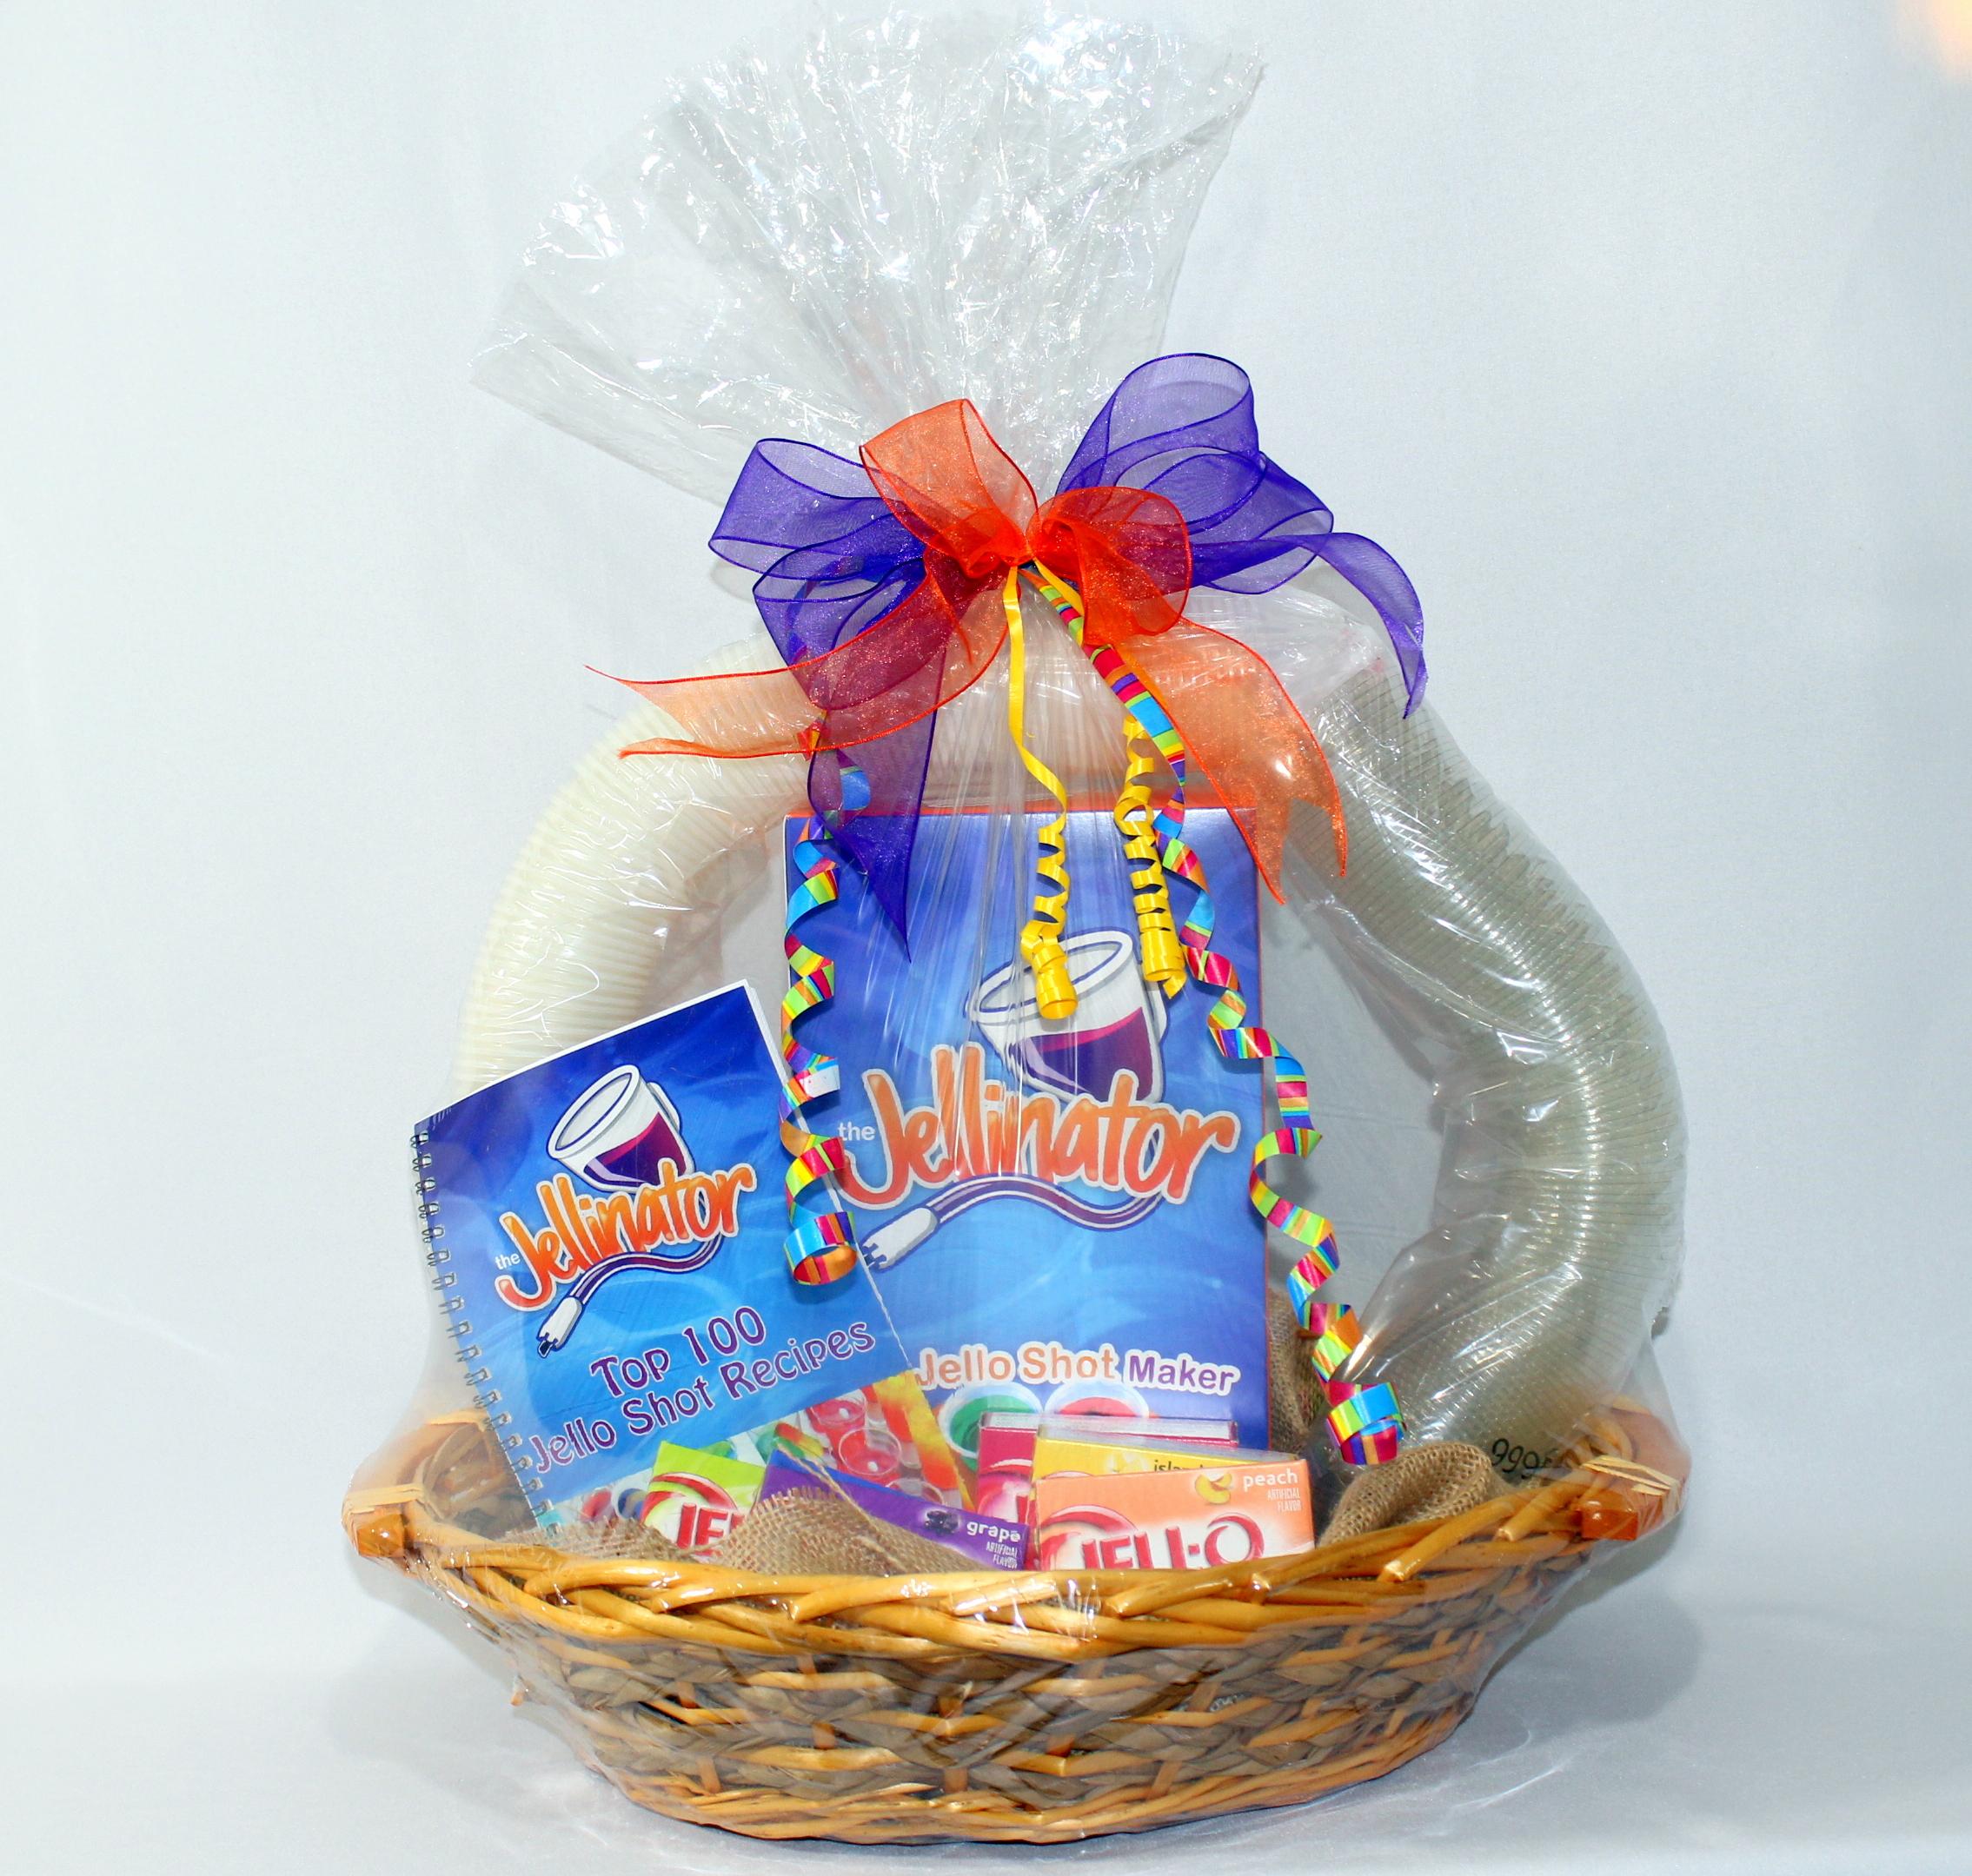 Jellinator Gift Basket Jello Shot 21st Birthday Baskets For Her